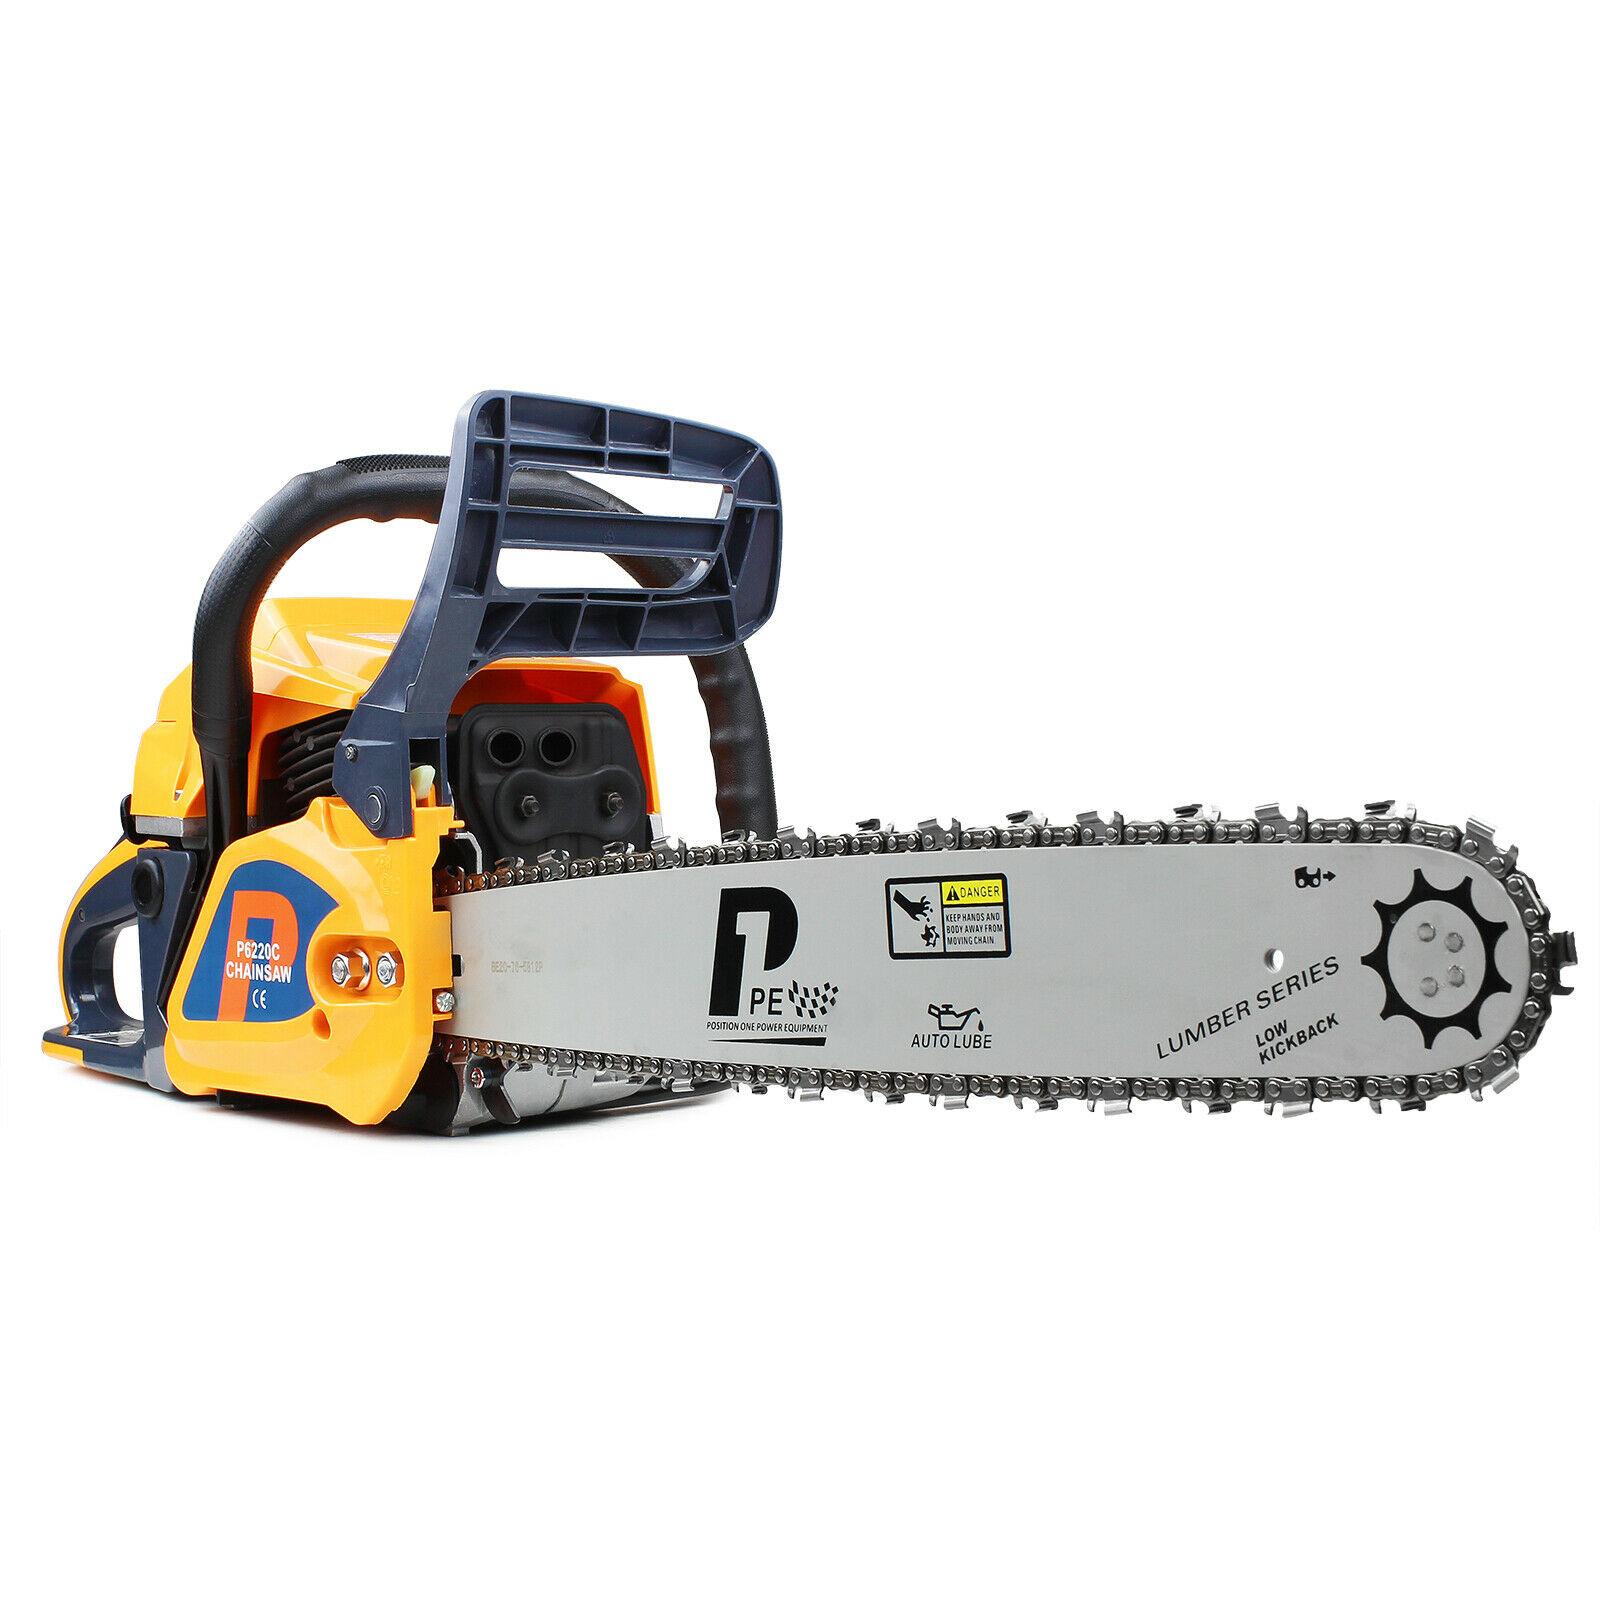 "Hyundai P1PE 20"" bar 62cc P6220C Petrol Chainsaw with Hyundai Carburettor for £107.99 delivered using code @ eBay / Hyundai"